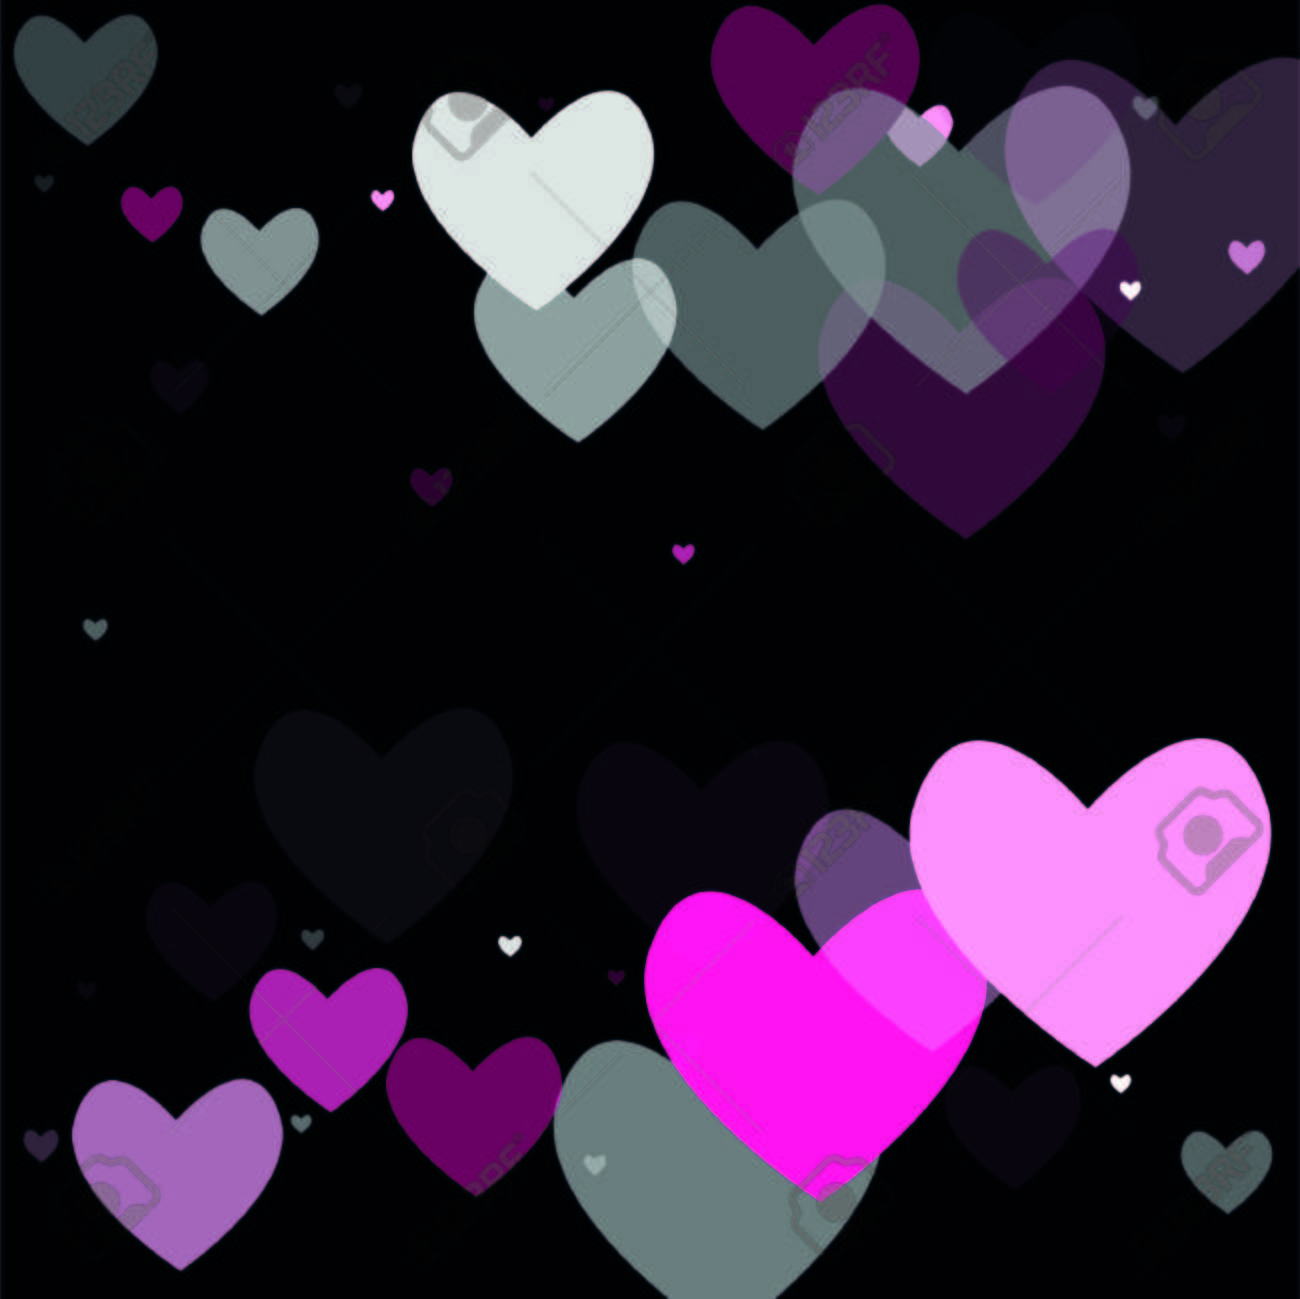 Beautiful Pink Confetti Hearts Falling On Black Background